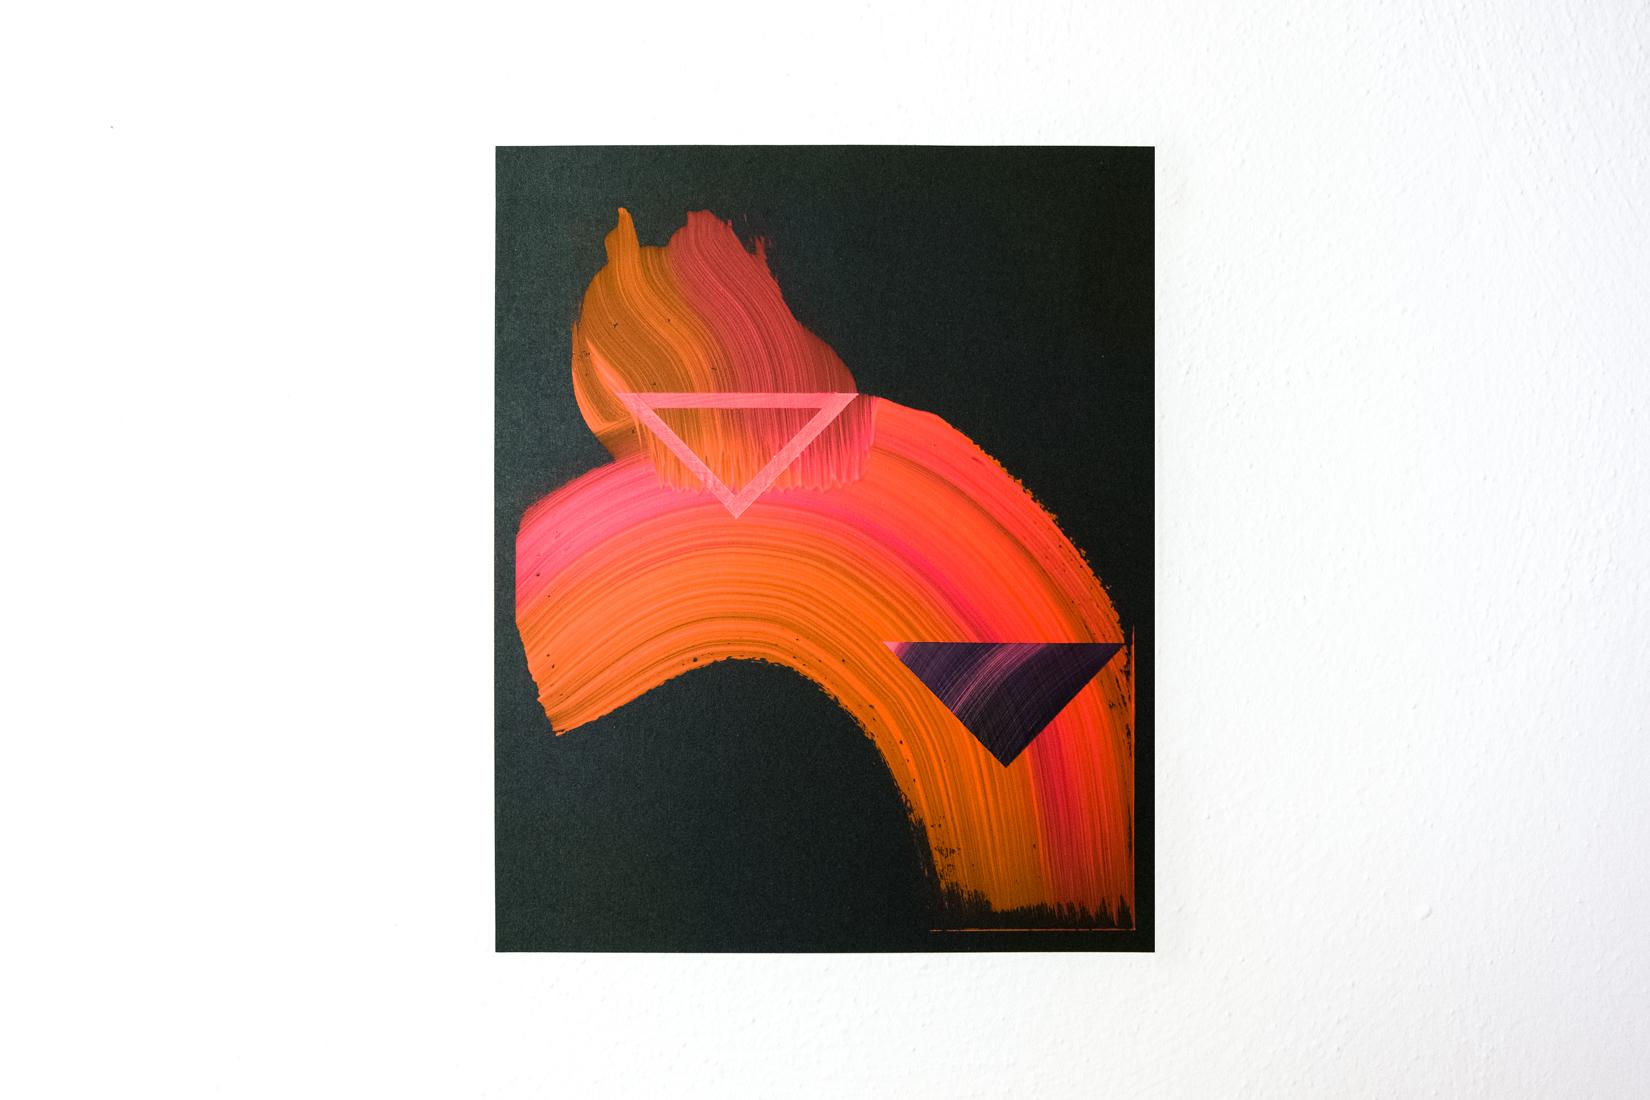 Lisa Denyer Embers 2018 acrylic on sandpaper 28x23cm.jpg